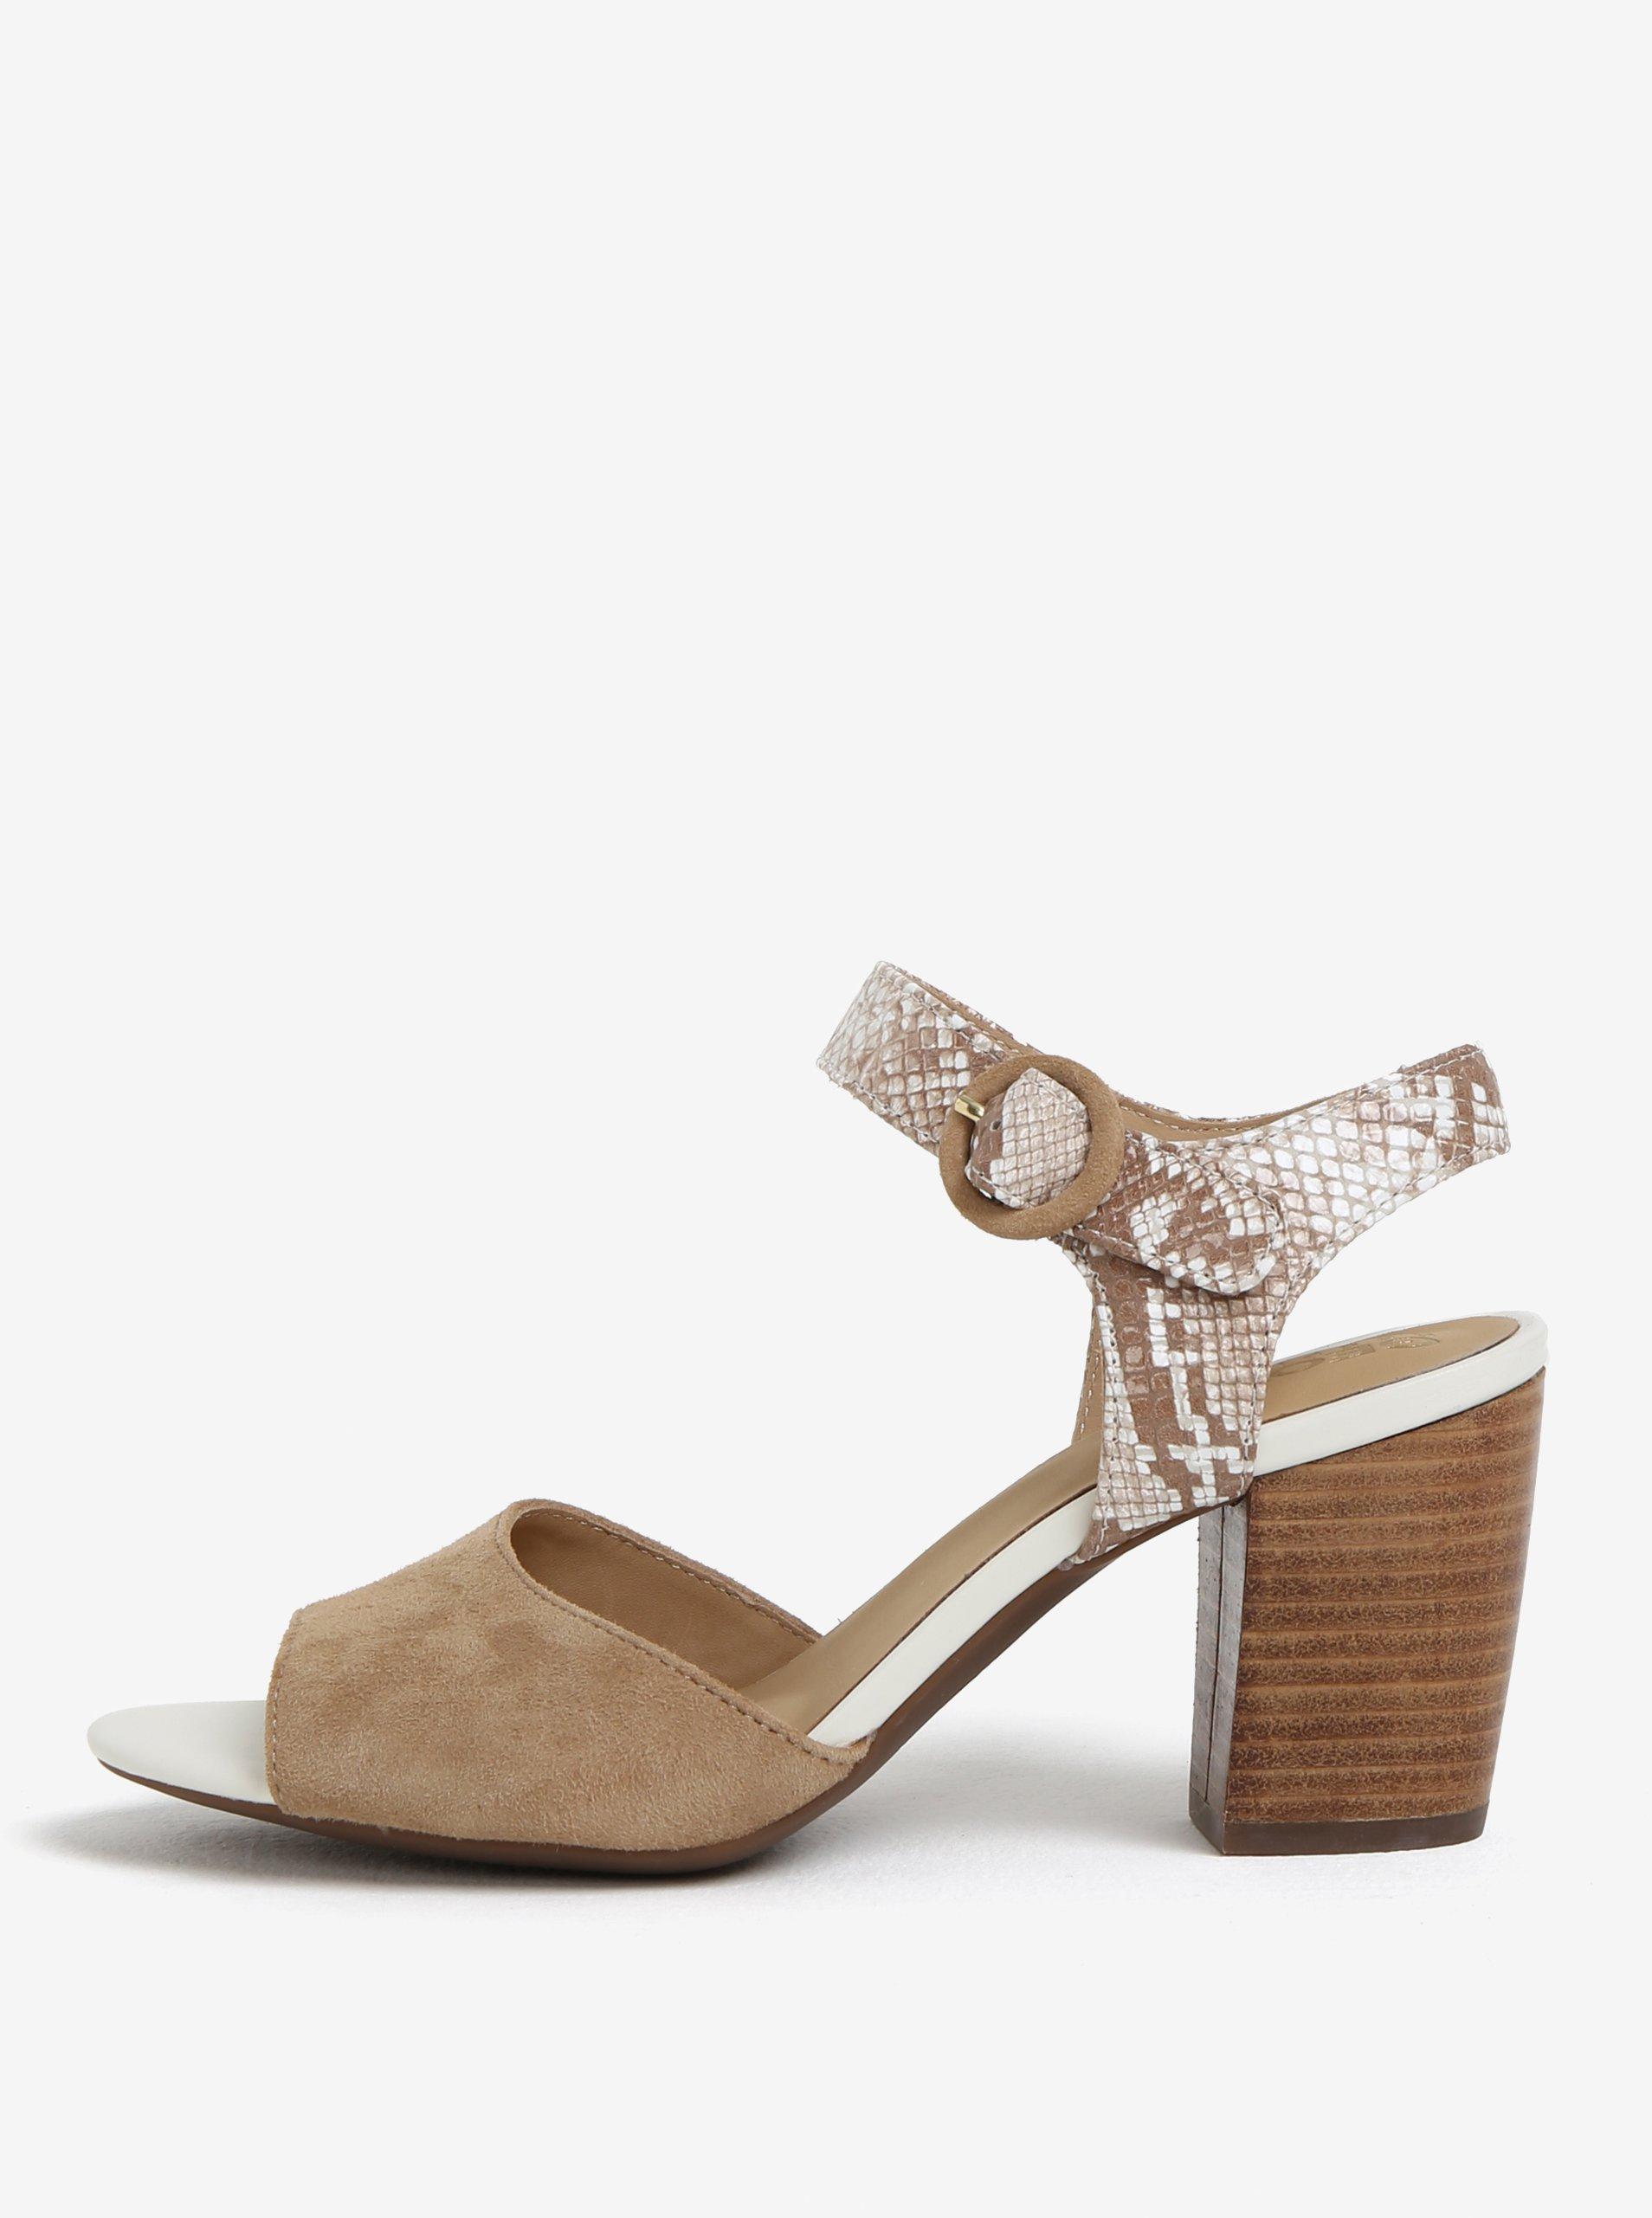 c742bdc312ea Béžové semišové sandále na podpätku Geox Eudora